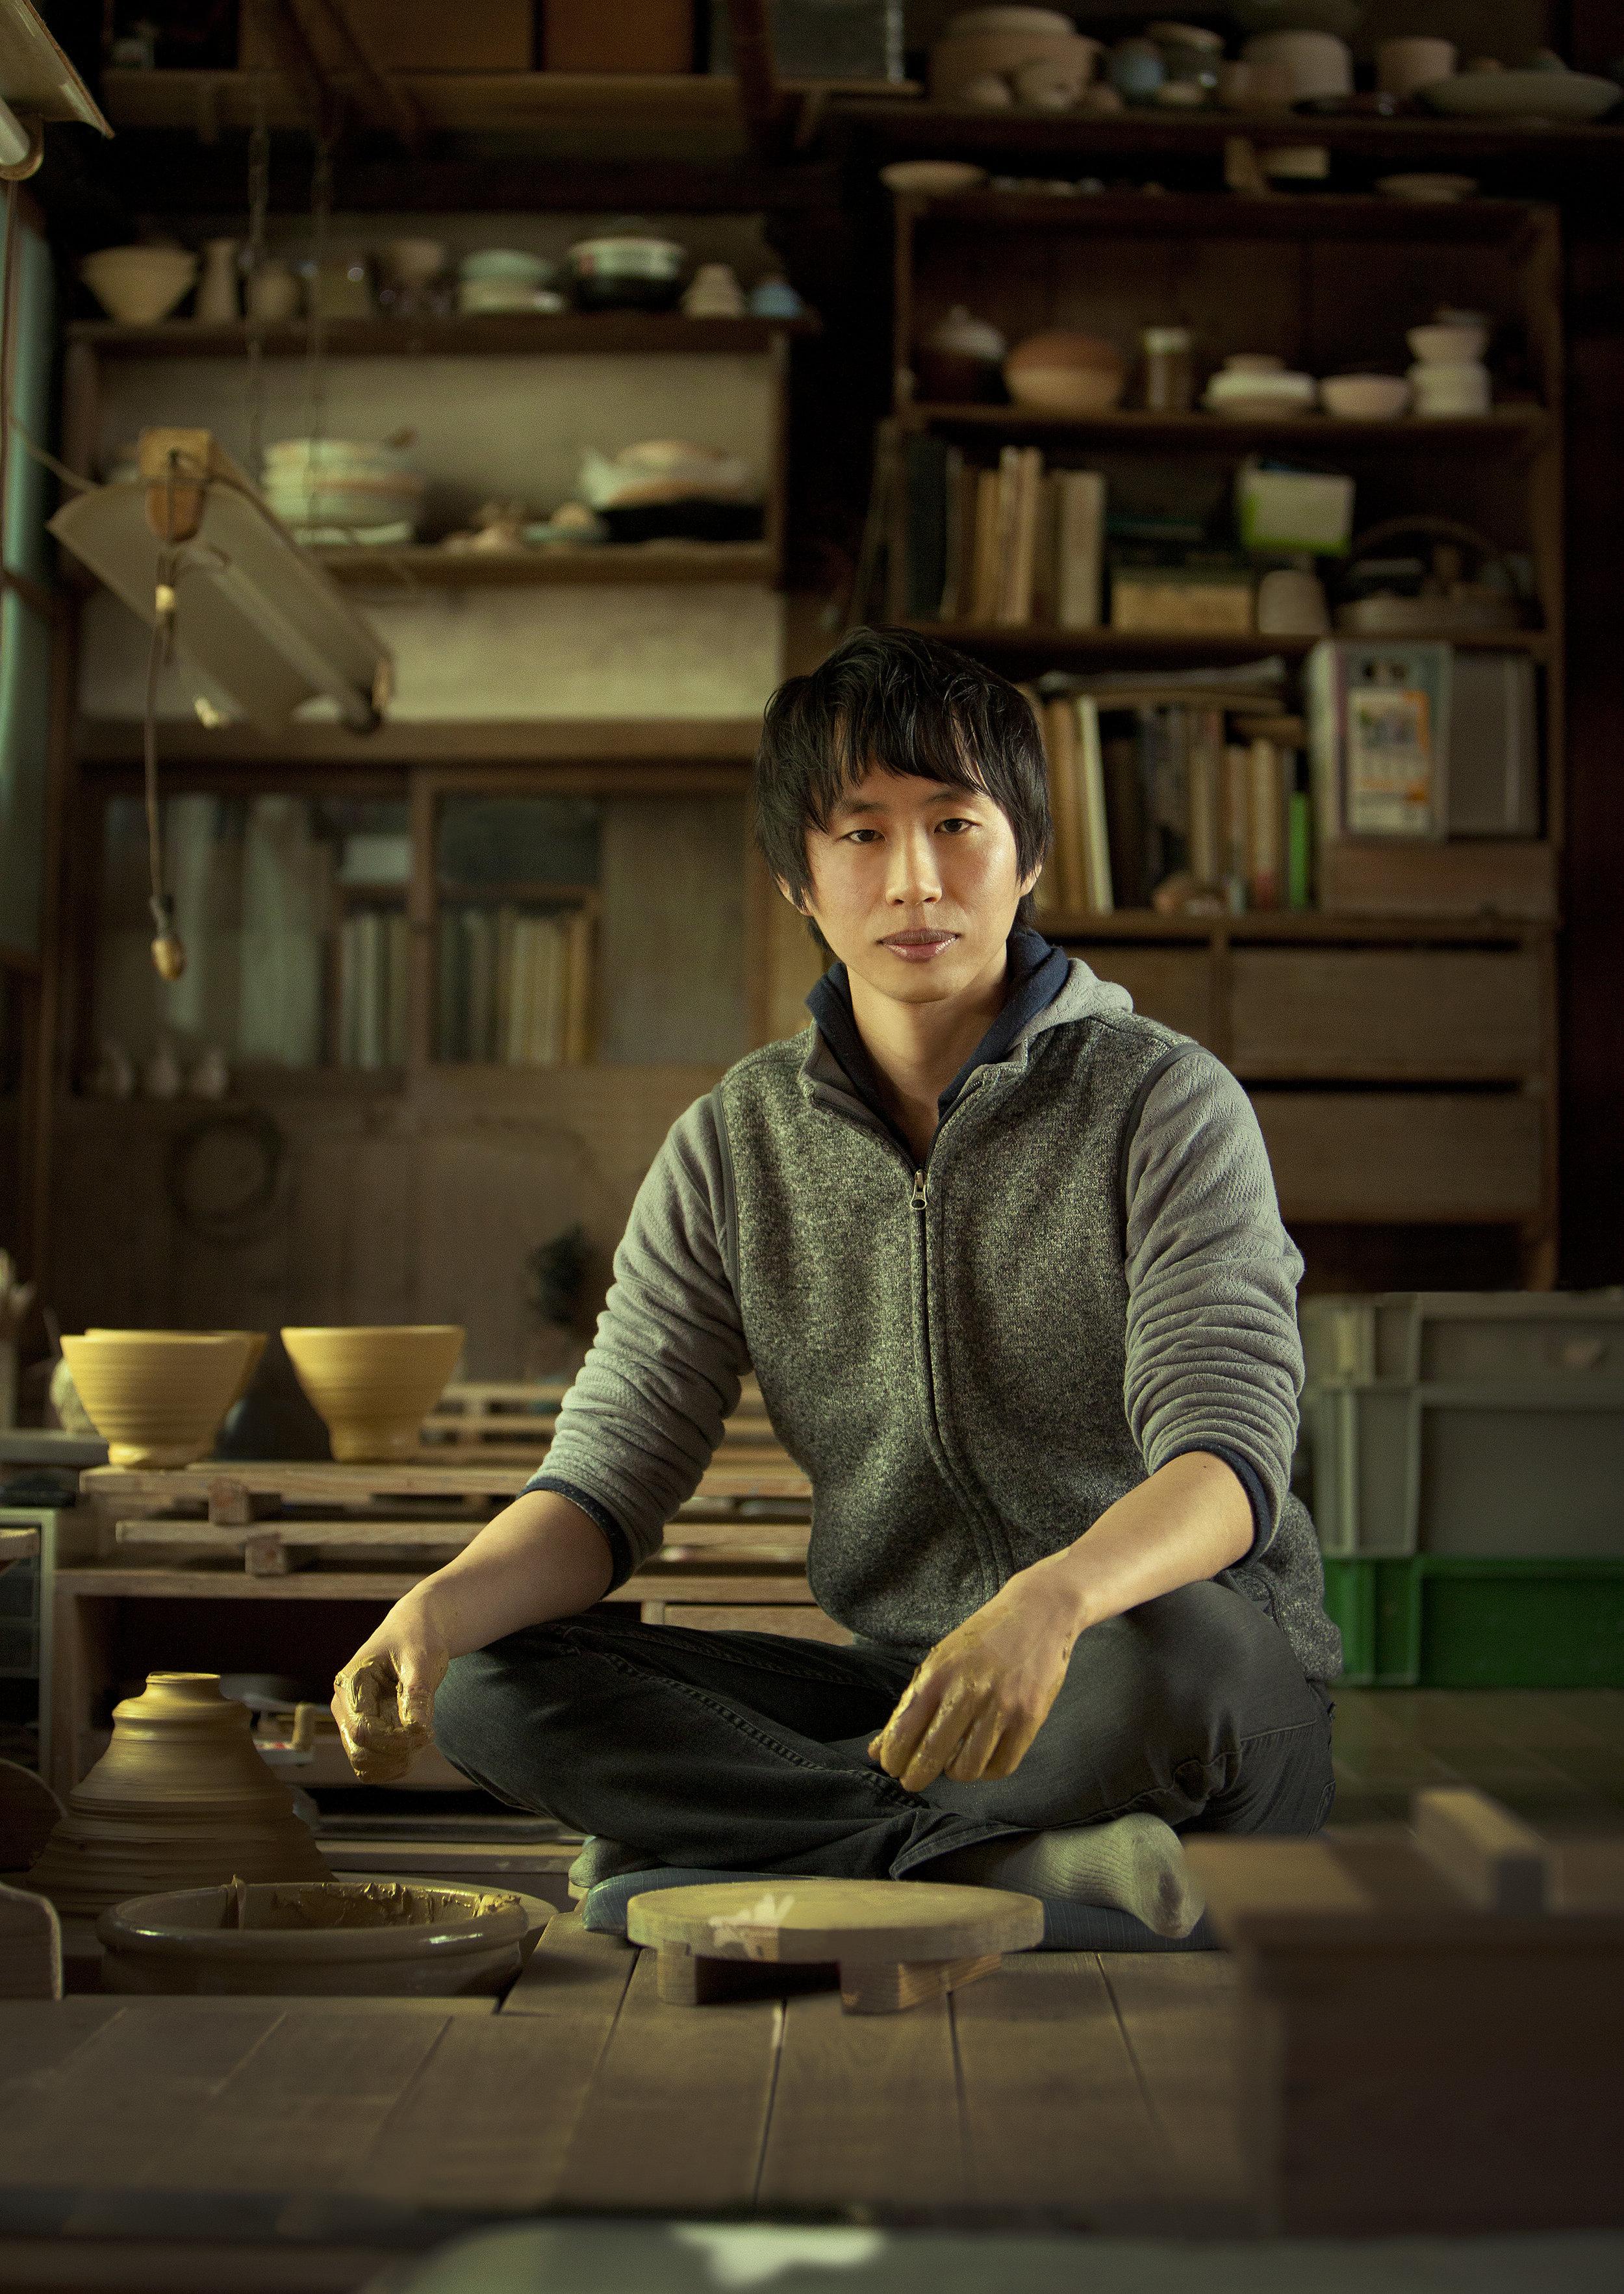 Asahiyaki Les Ateliers Courbet Portrait Kyoto